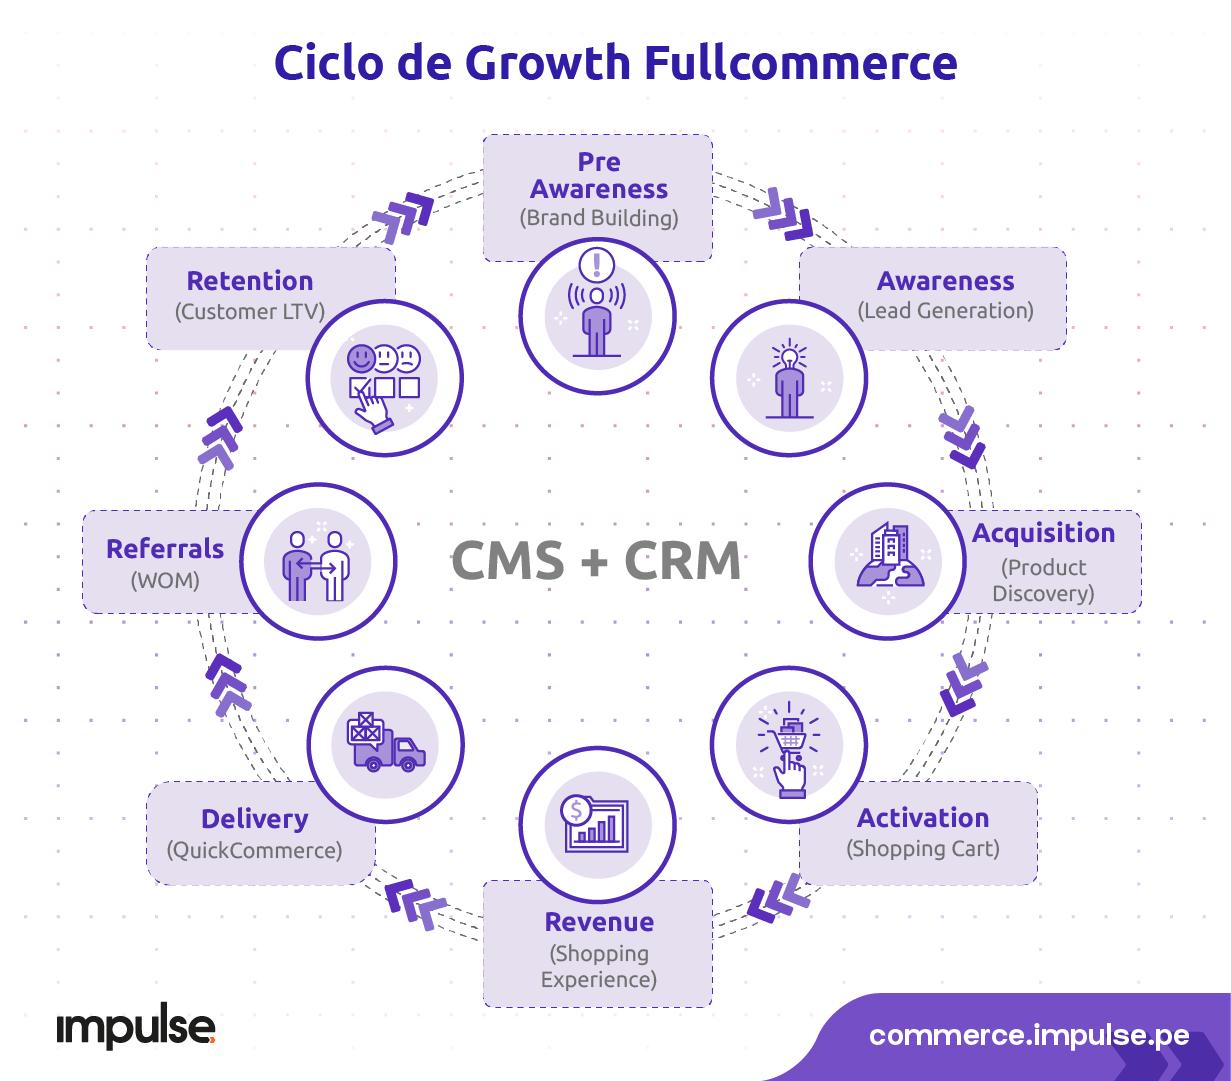 ciclo de growth fullcommerce cms crm